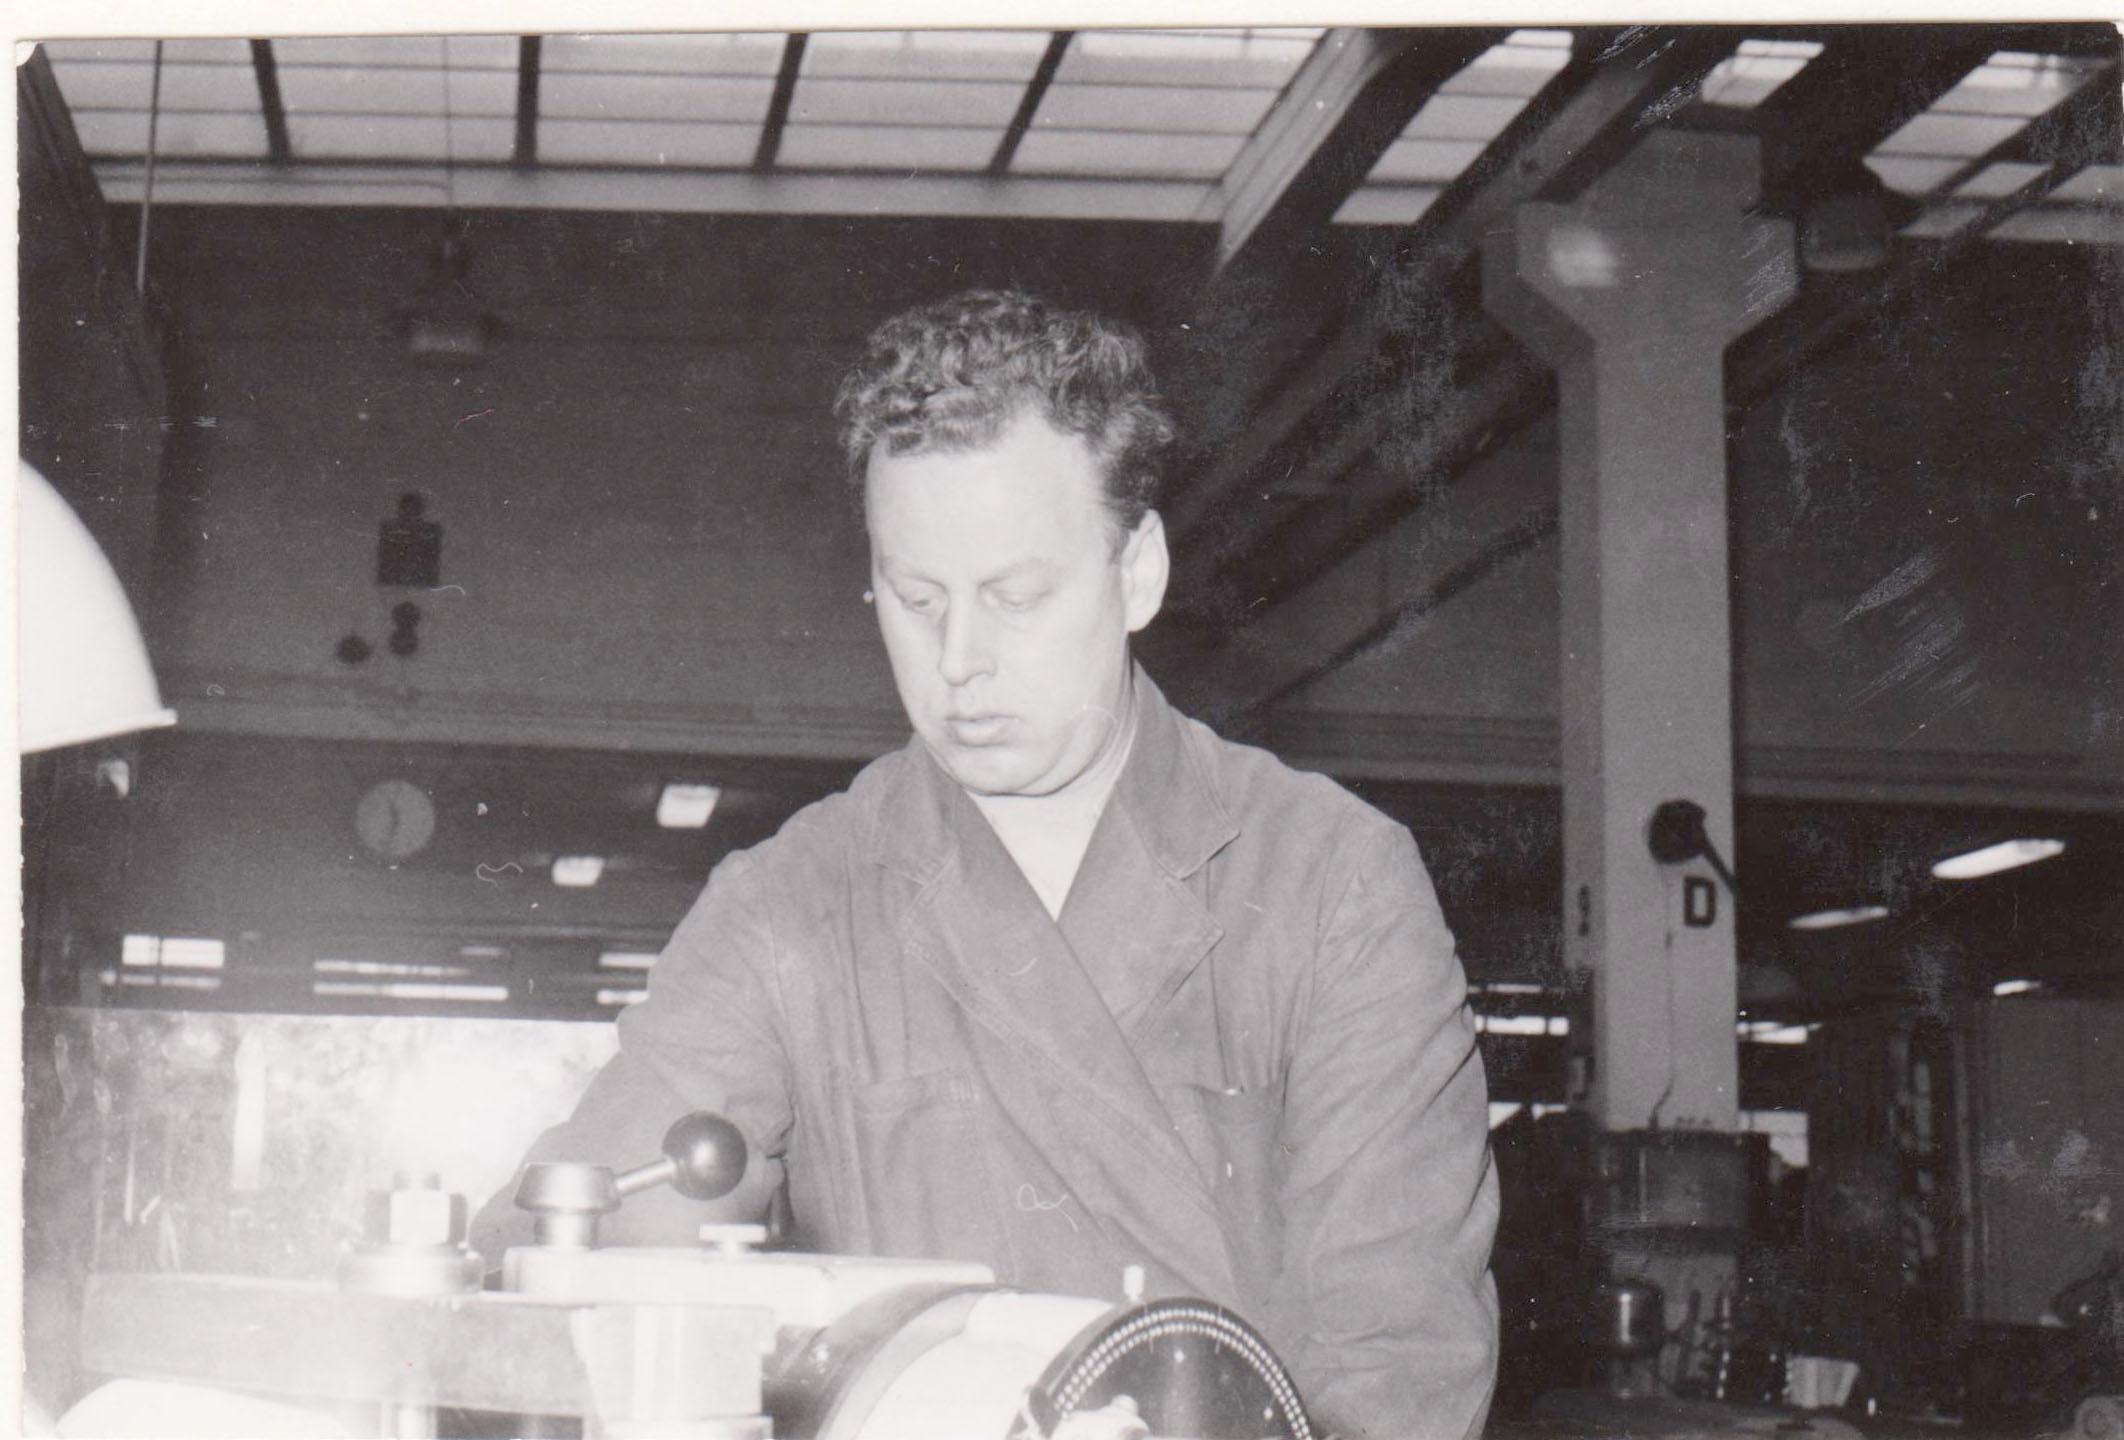 John Johansson